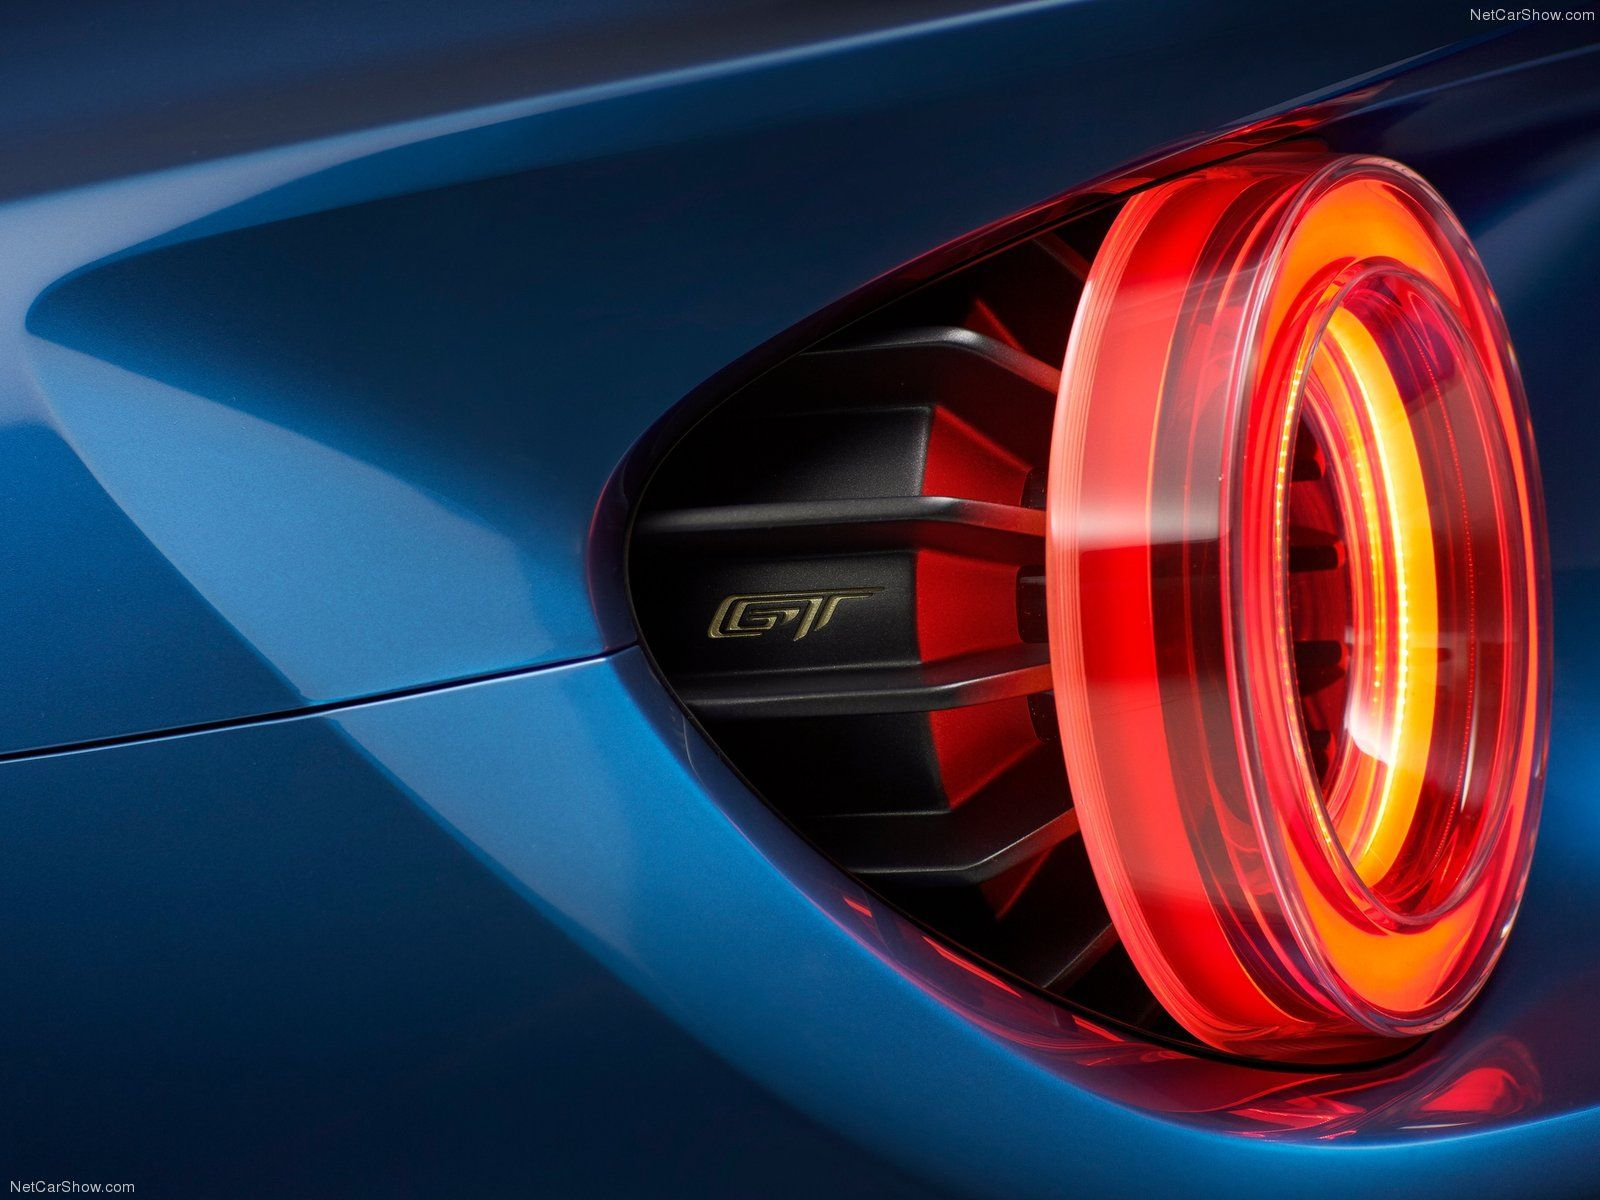 Ford Gt 2017 Futuristic Cars 포드 Gt 미래의 자동차 포드